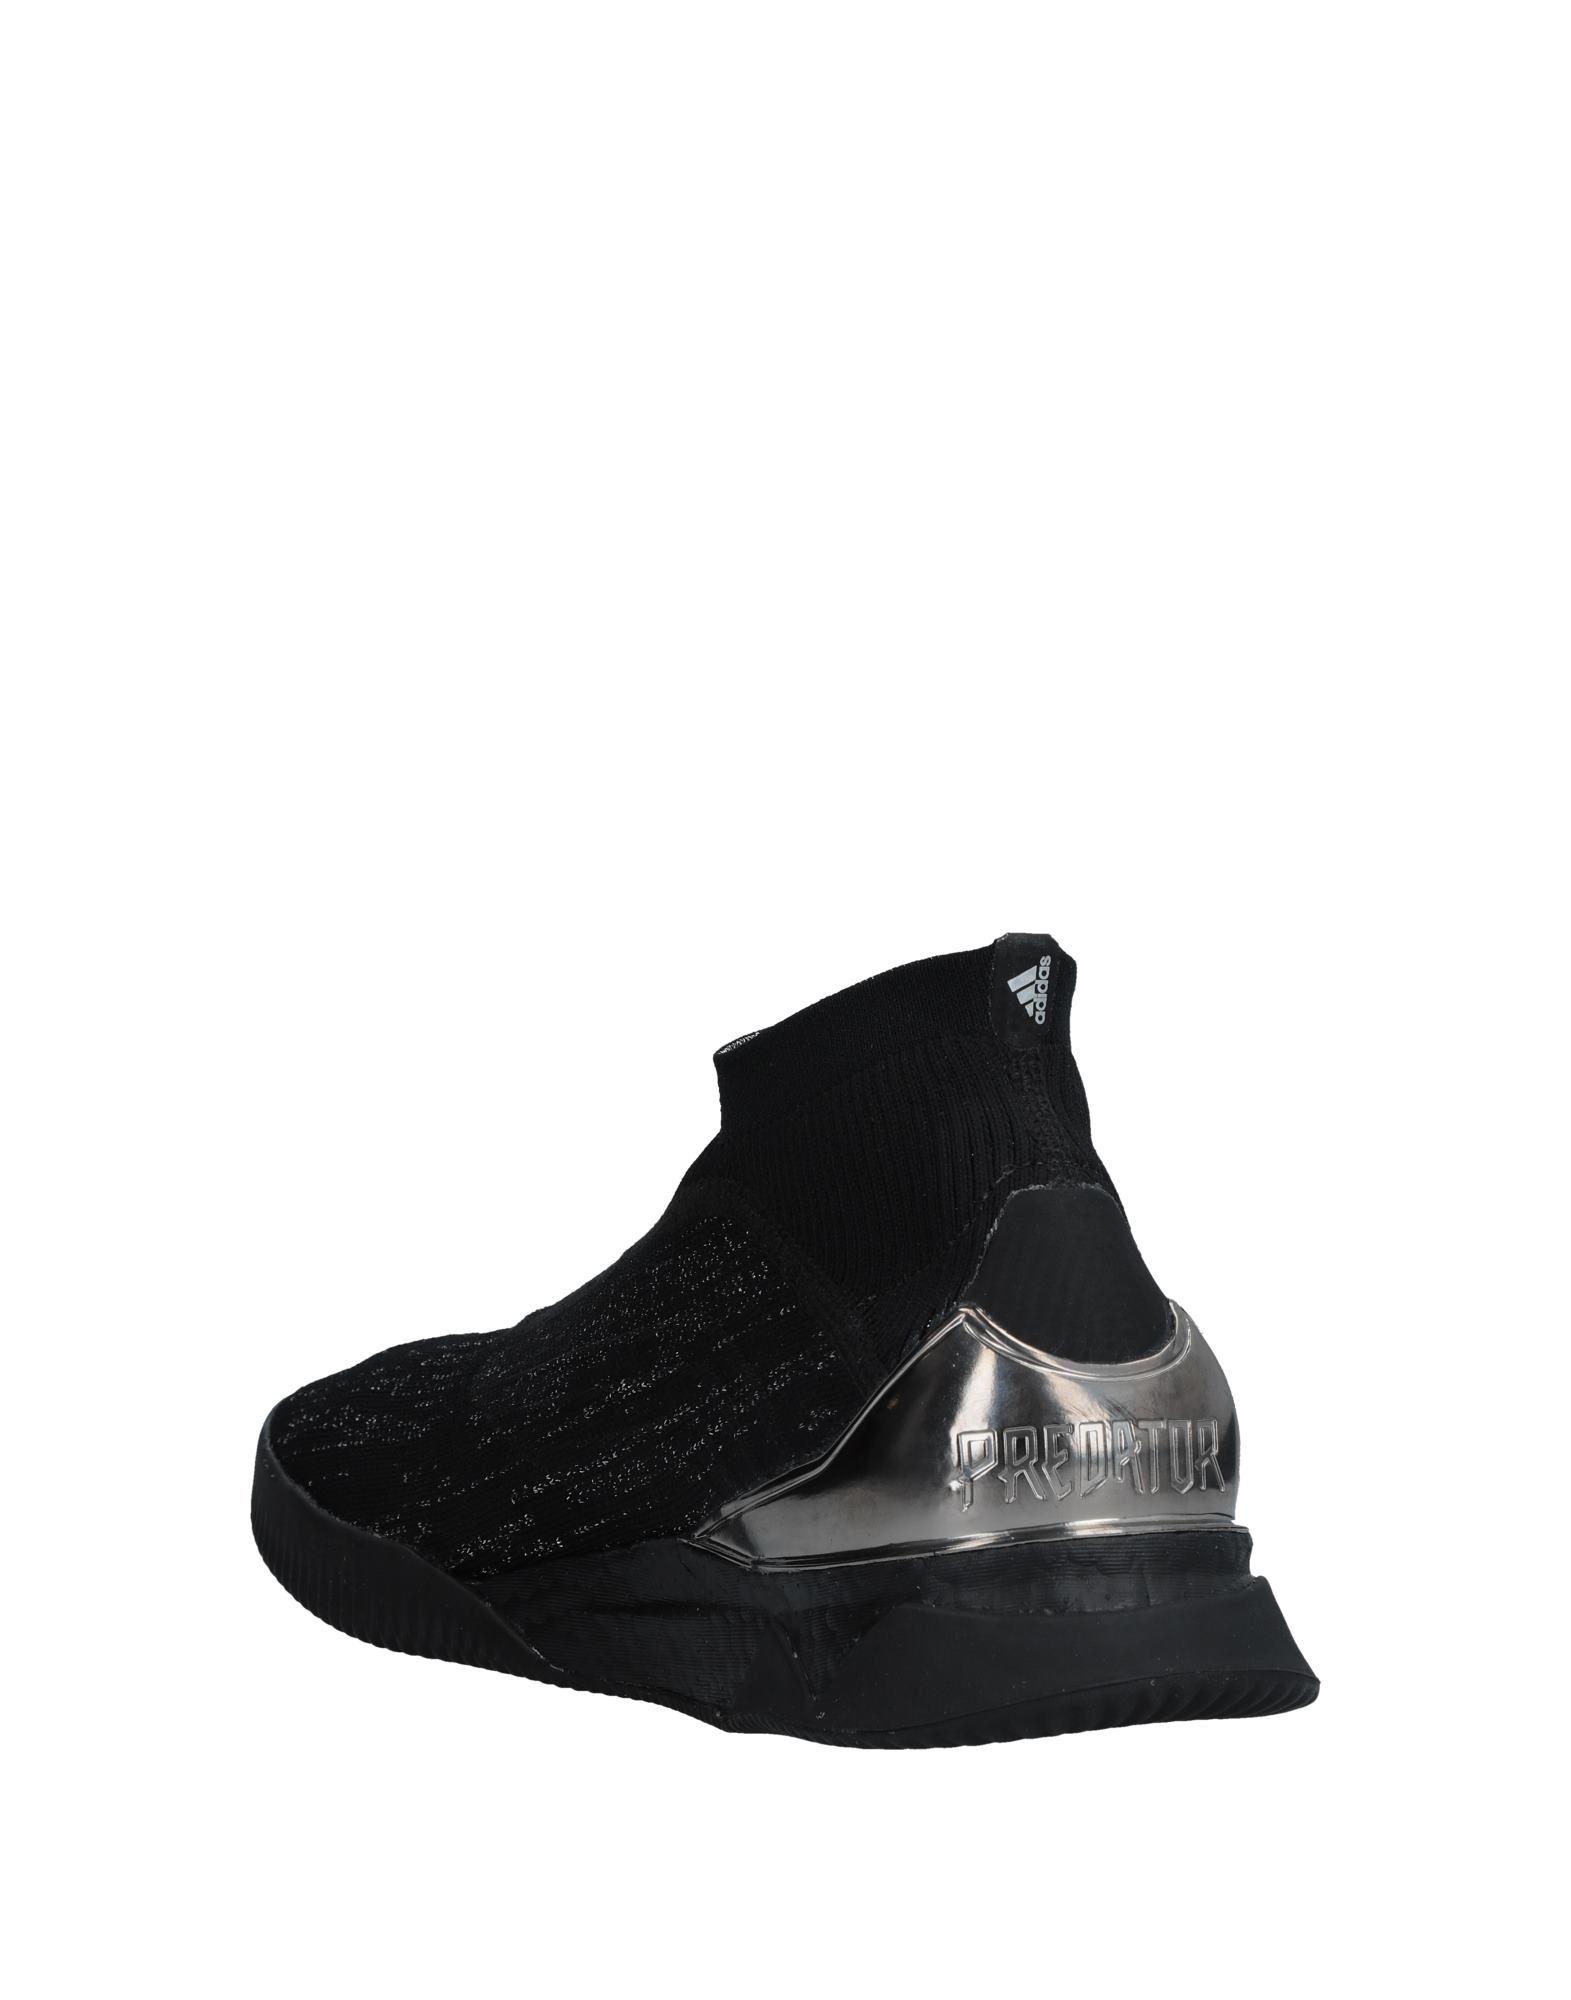 Adidas Sneakers Gute Herren  11541961GU Gute Sneakers Qualität beliebte Schuhe fdf8d4